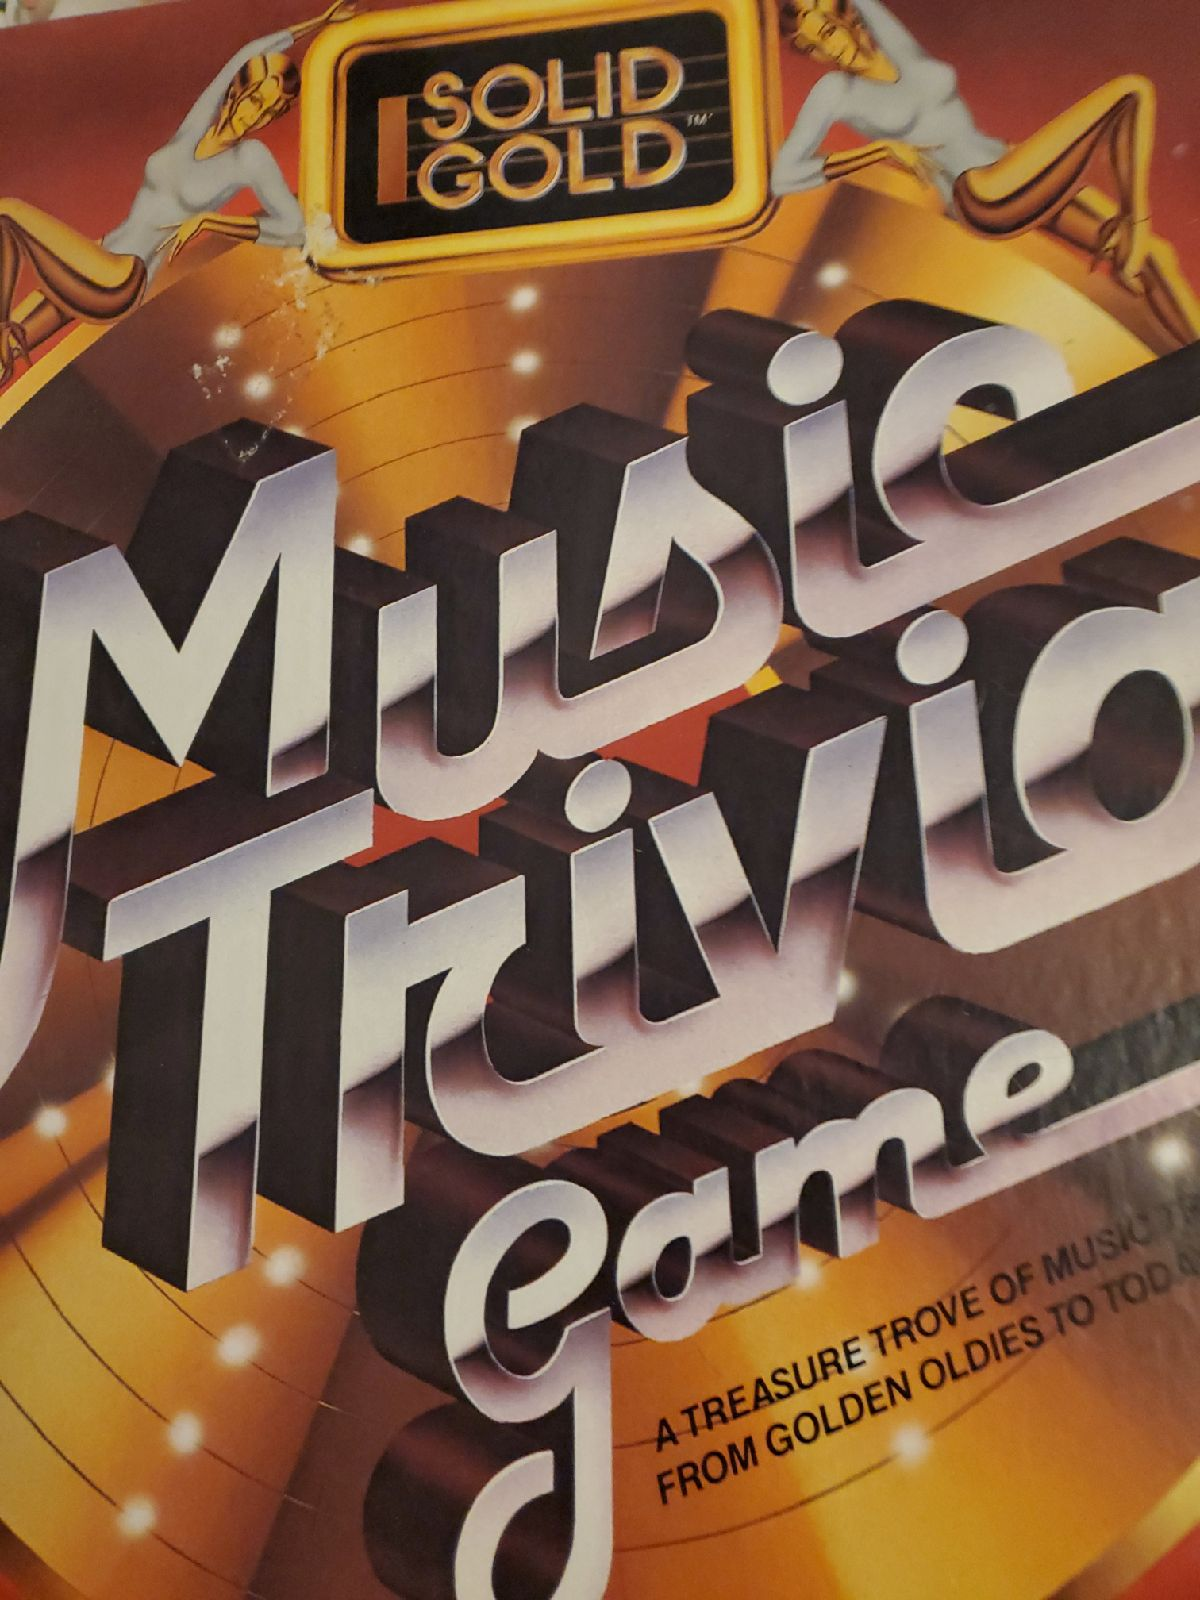 VTG IDEAL Solid Gold MUSIC TRIVIA Game